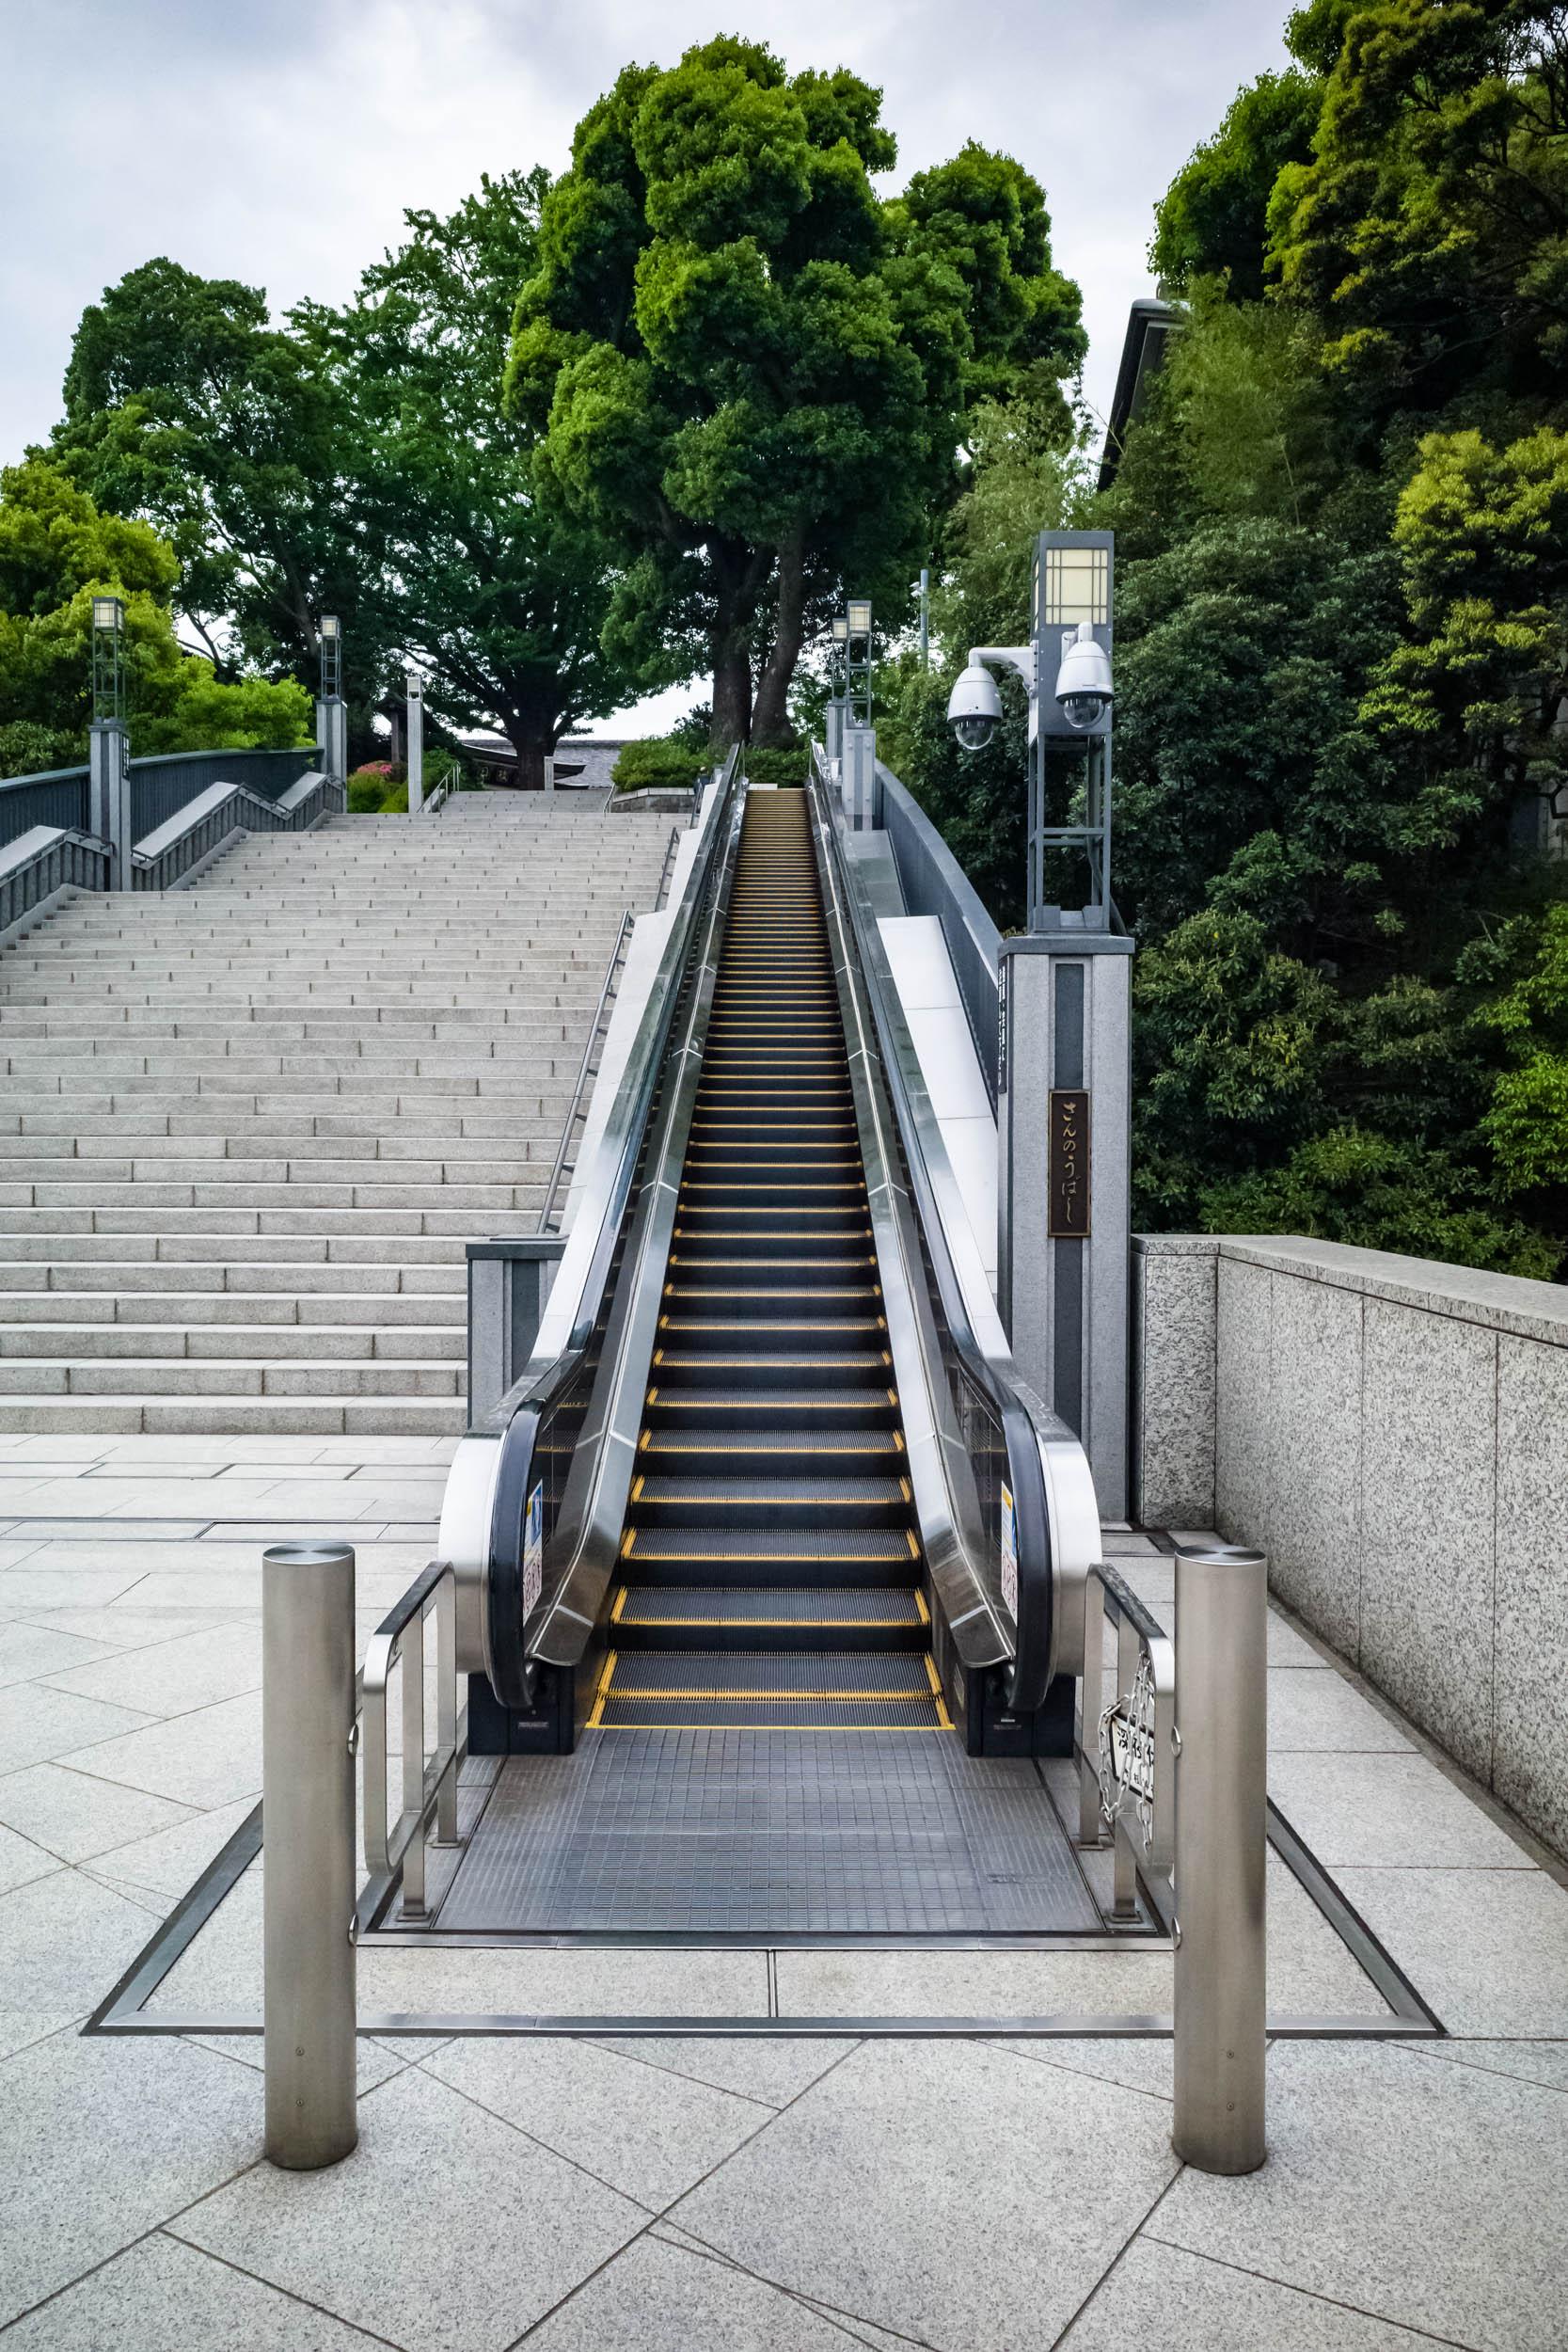 The second escalator